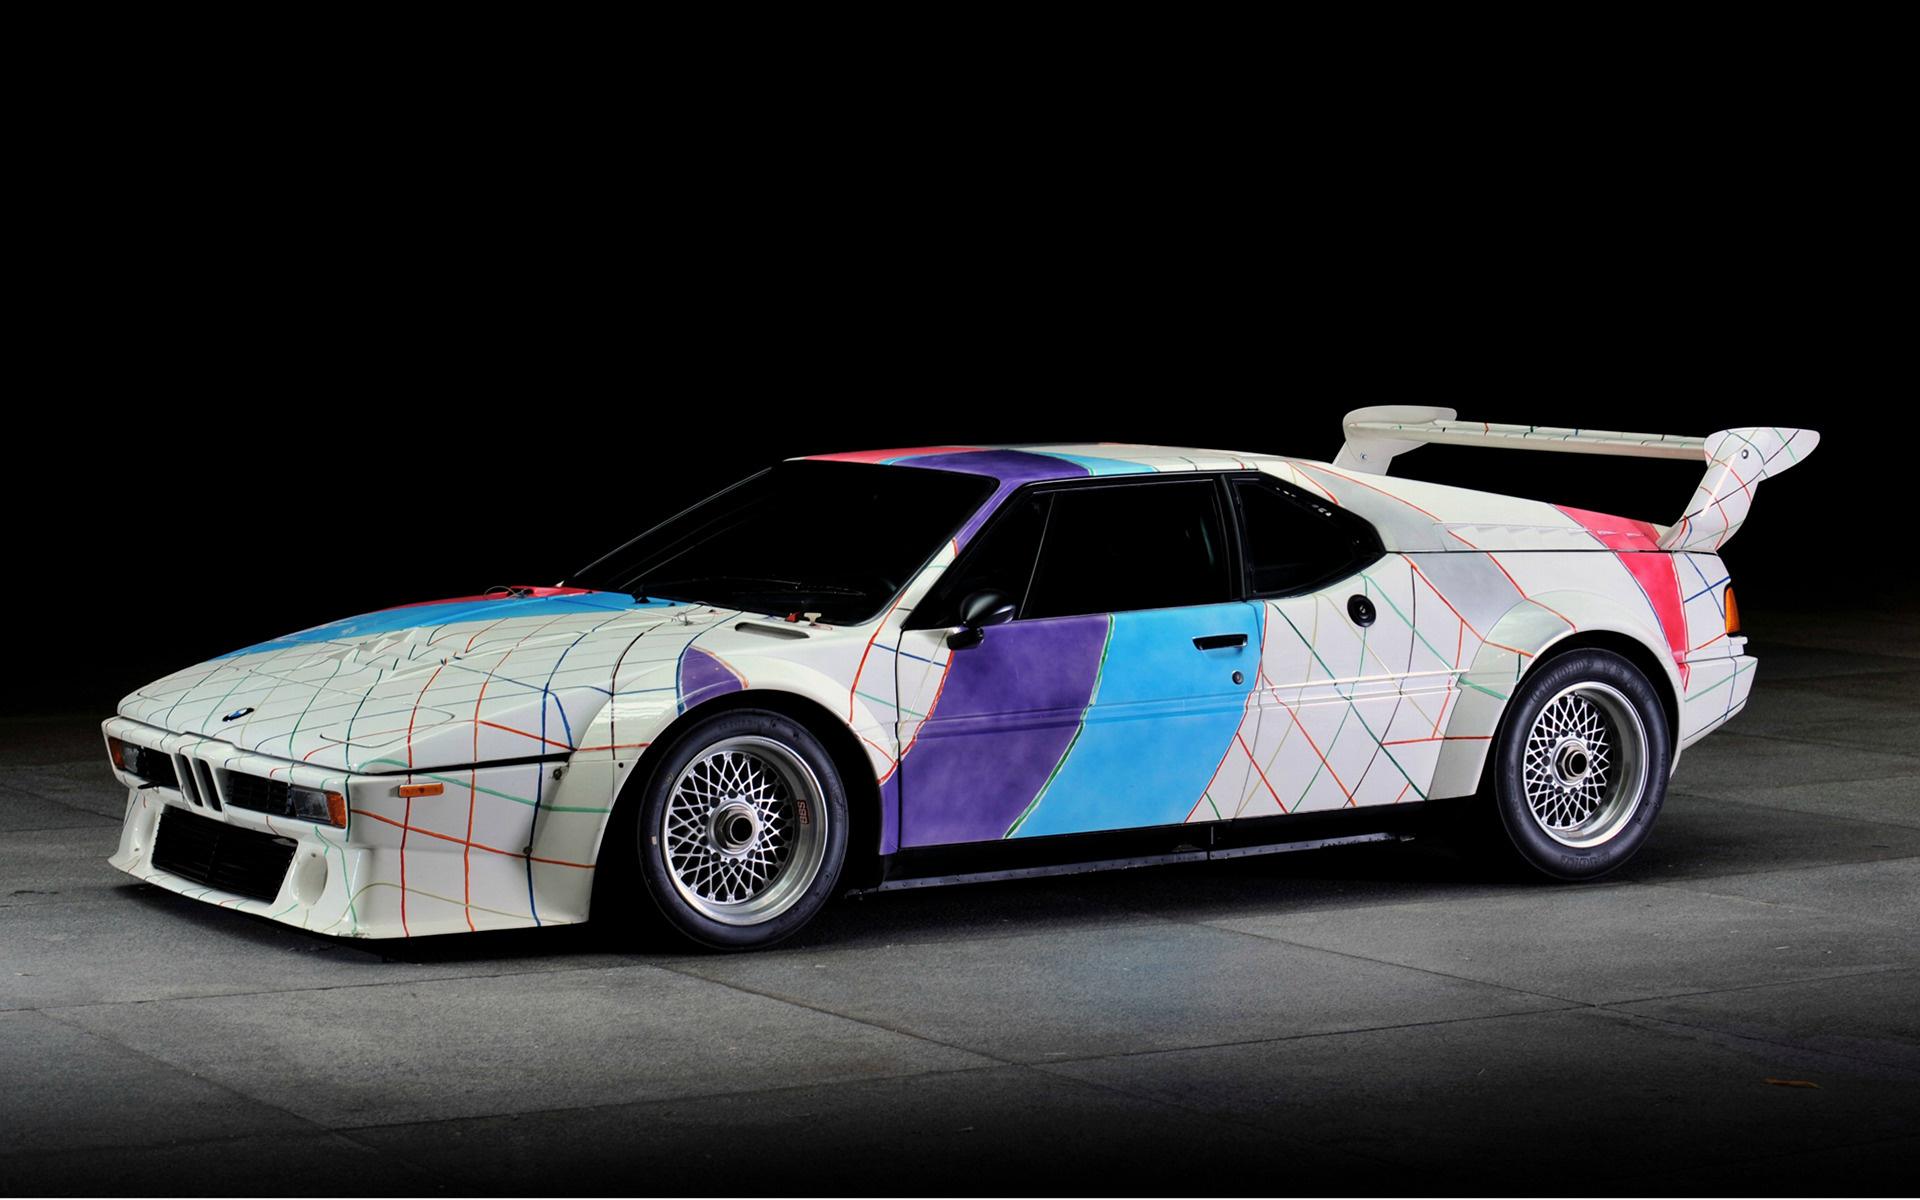 1979 Bmw M1 Procar Art Car By Frank Stella Wallpapers And Hd